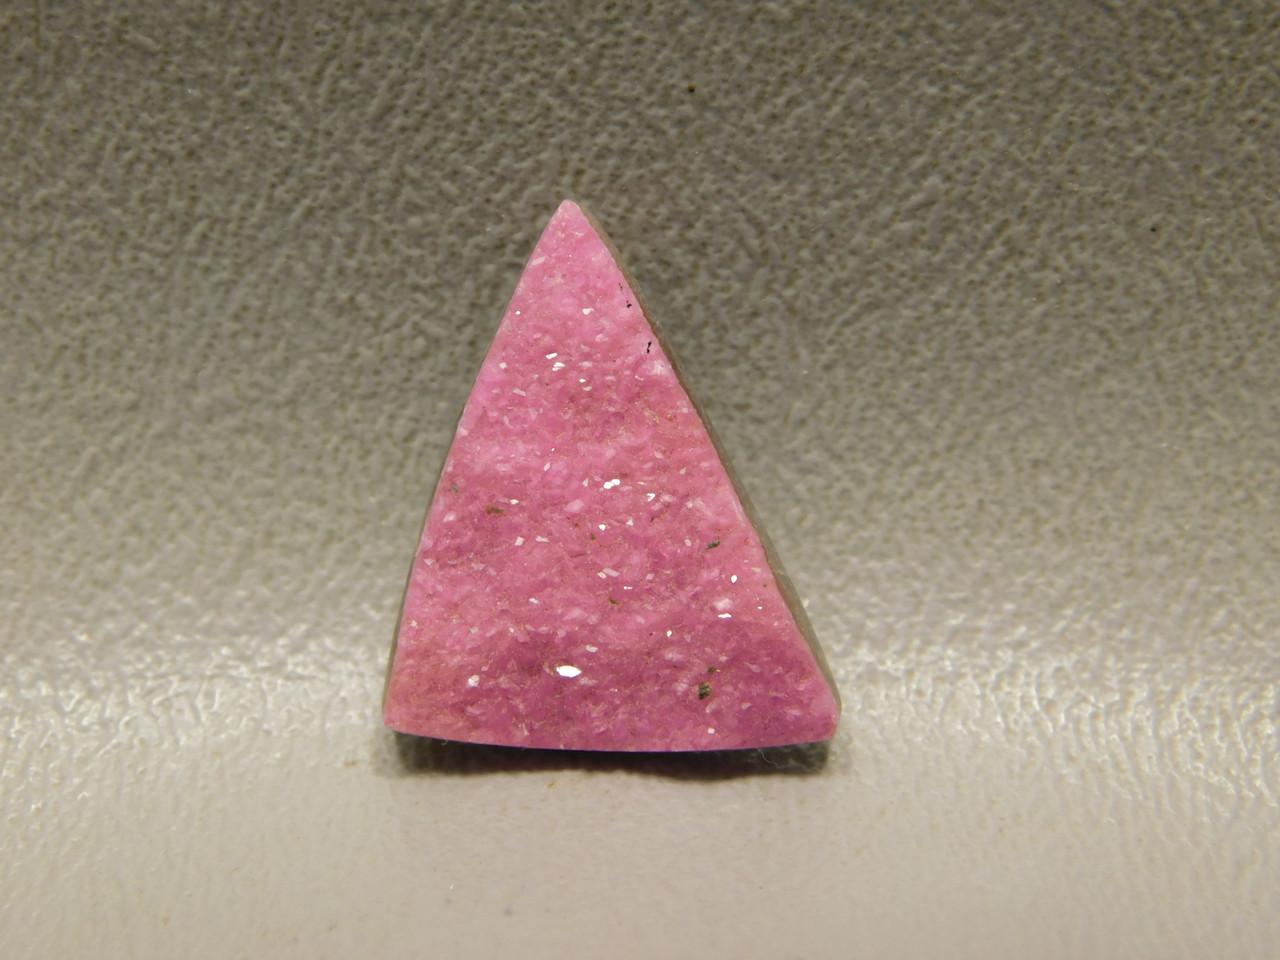 Cobaltian Calcite Pink Drusy Crystal Designer Cabochon #15